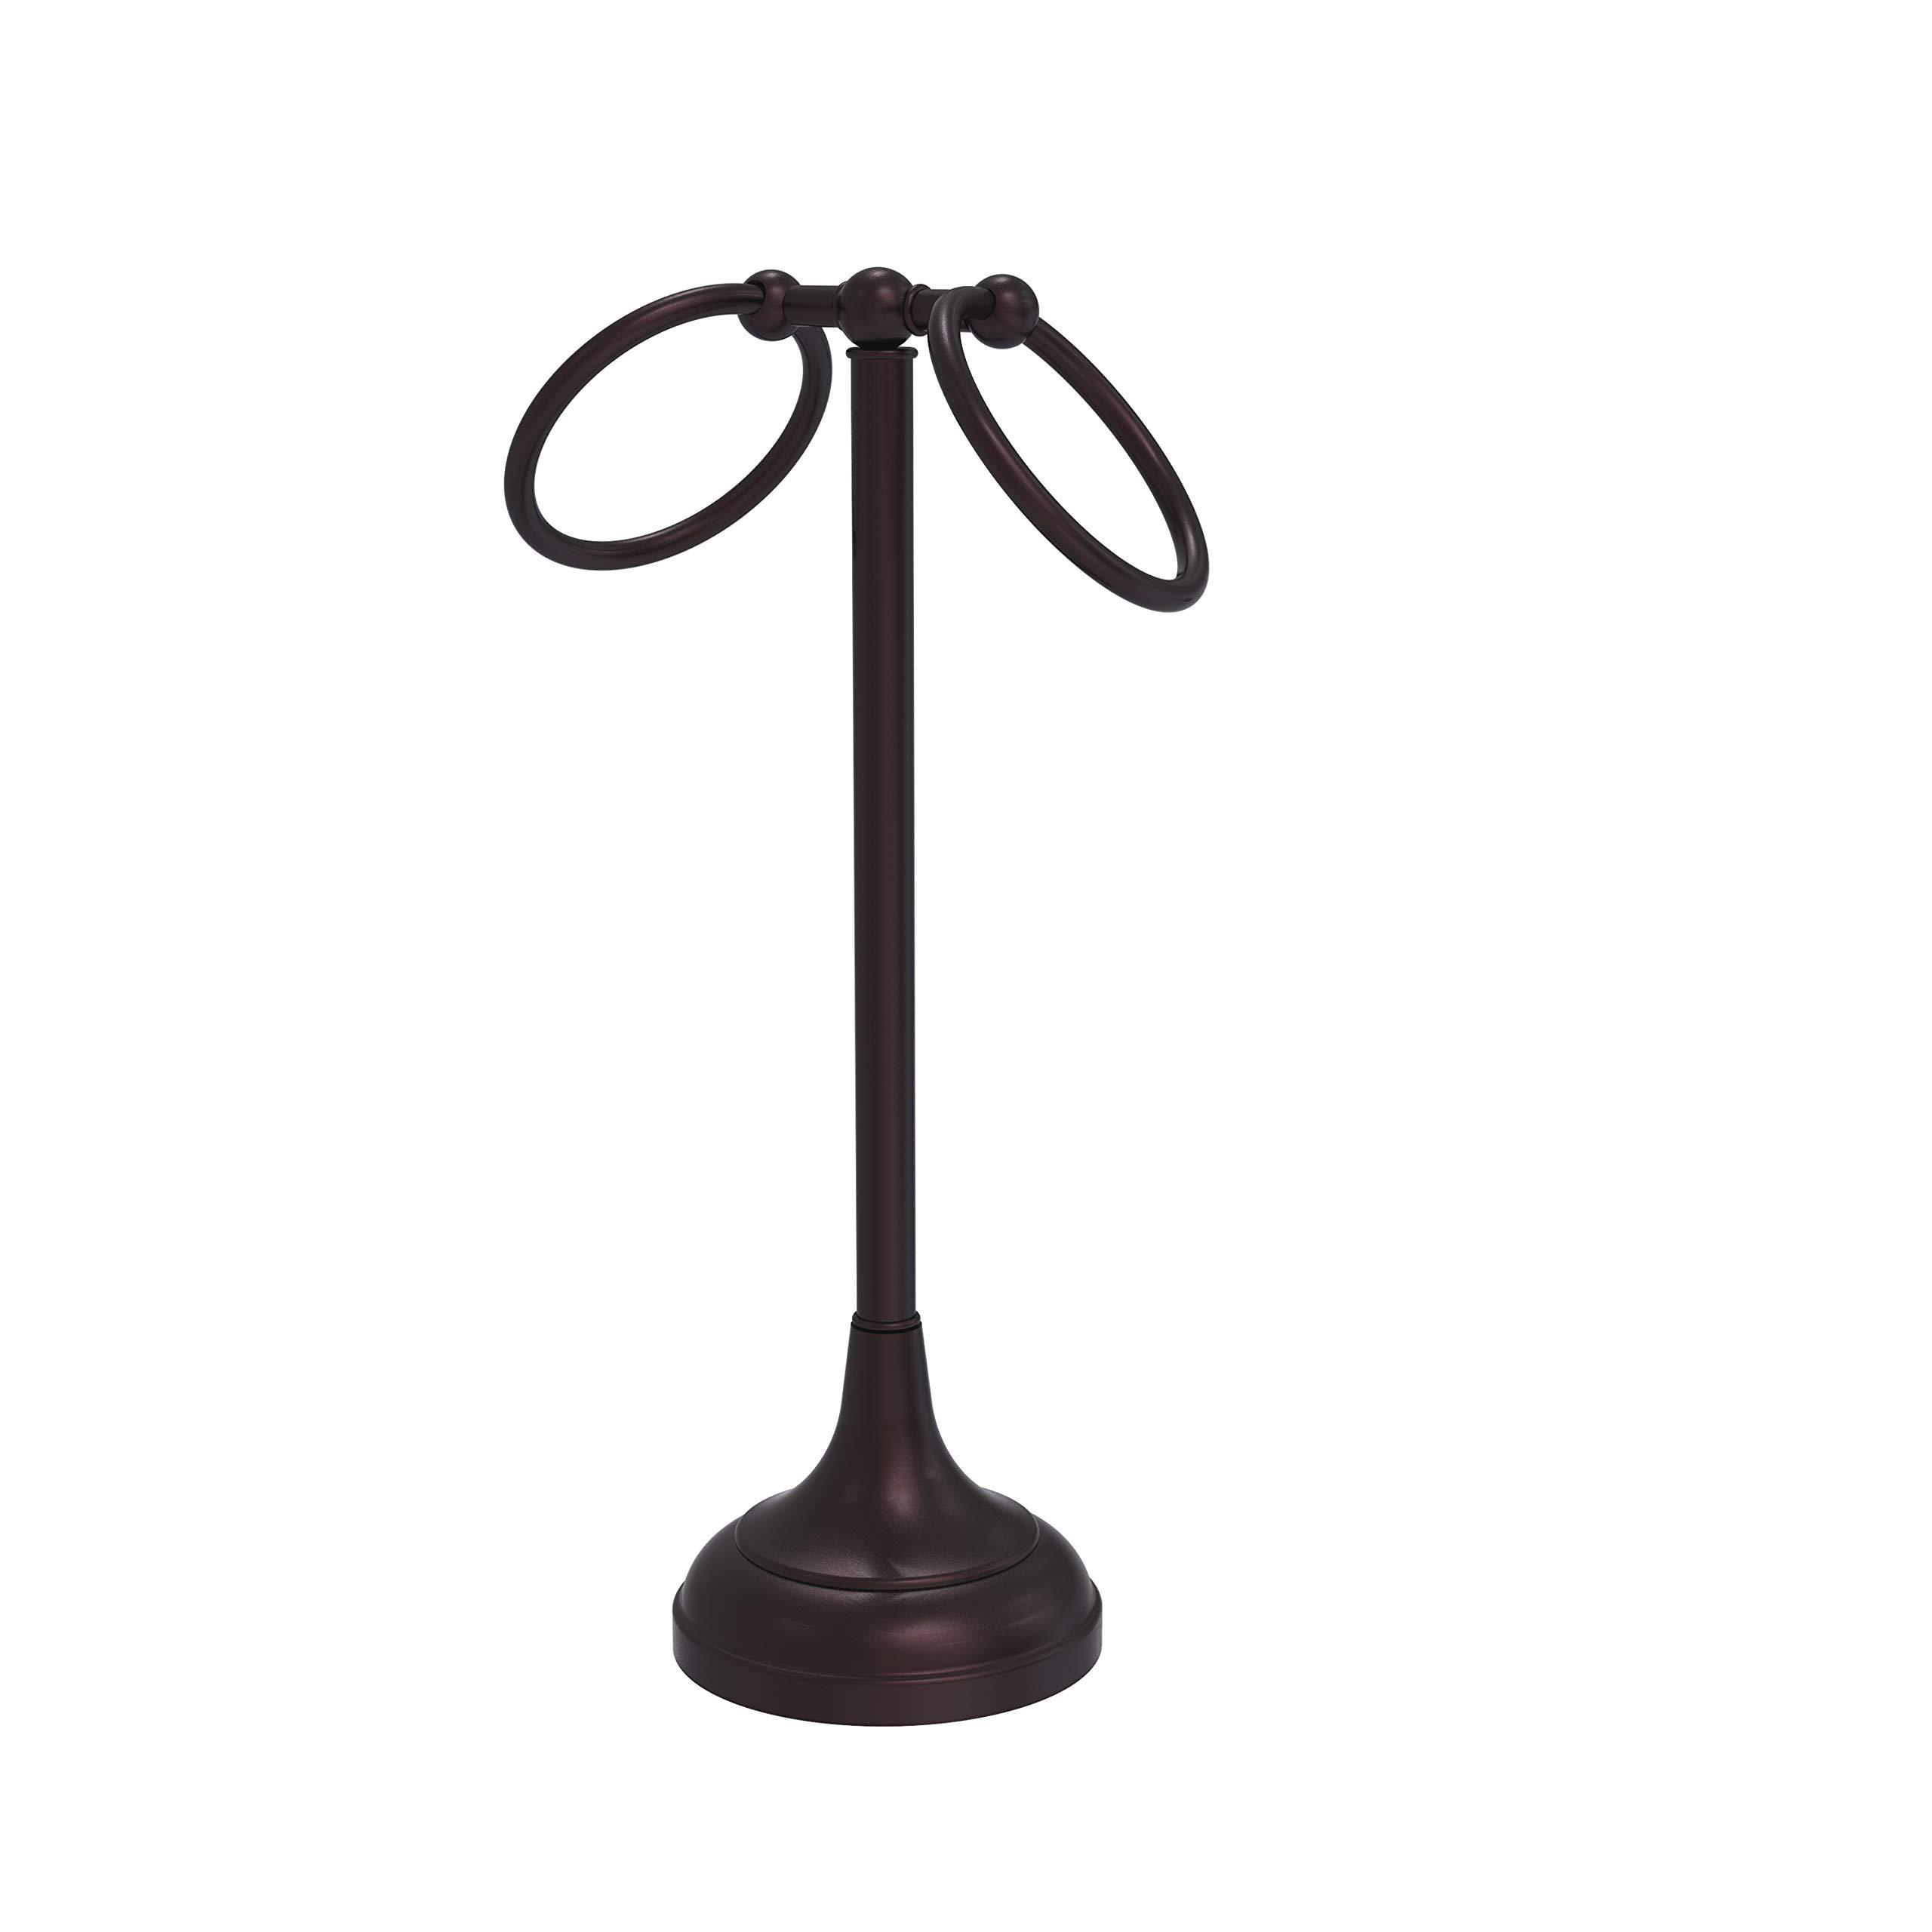 Allied Brass TR-12 Vanity Top 2 Ring Guest Towel Holder, Antique Bronze